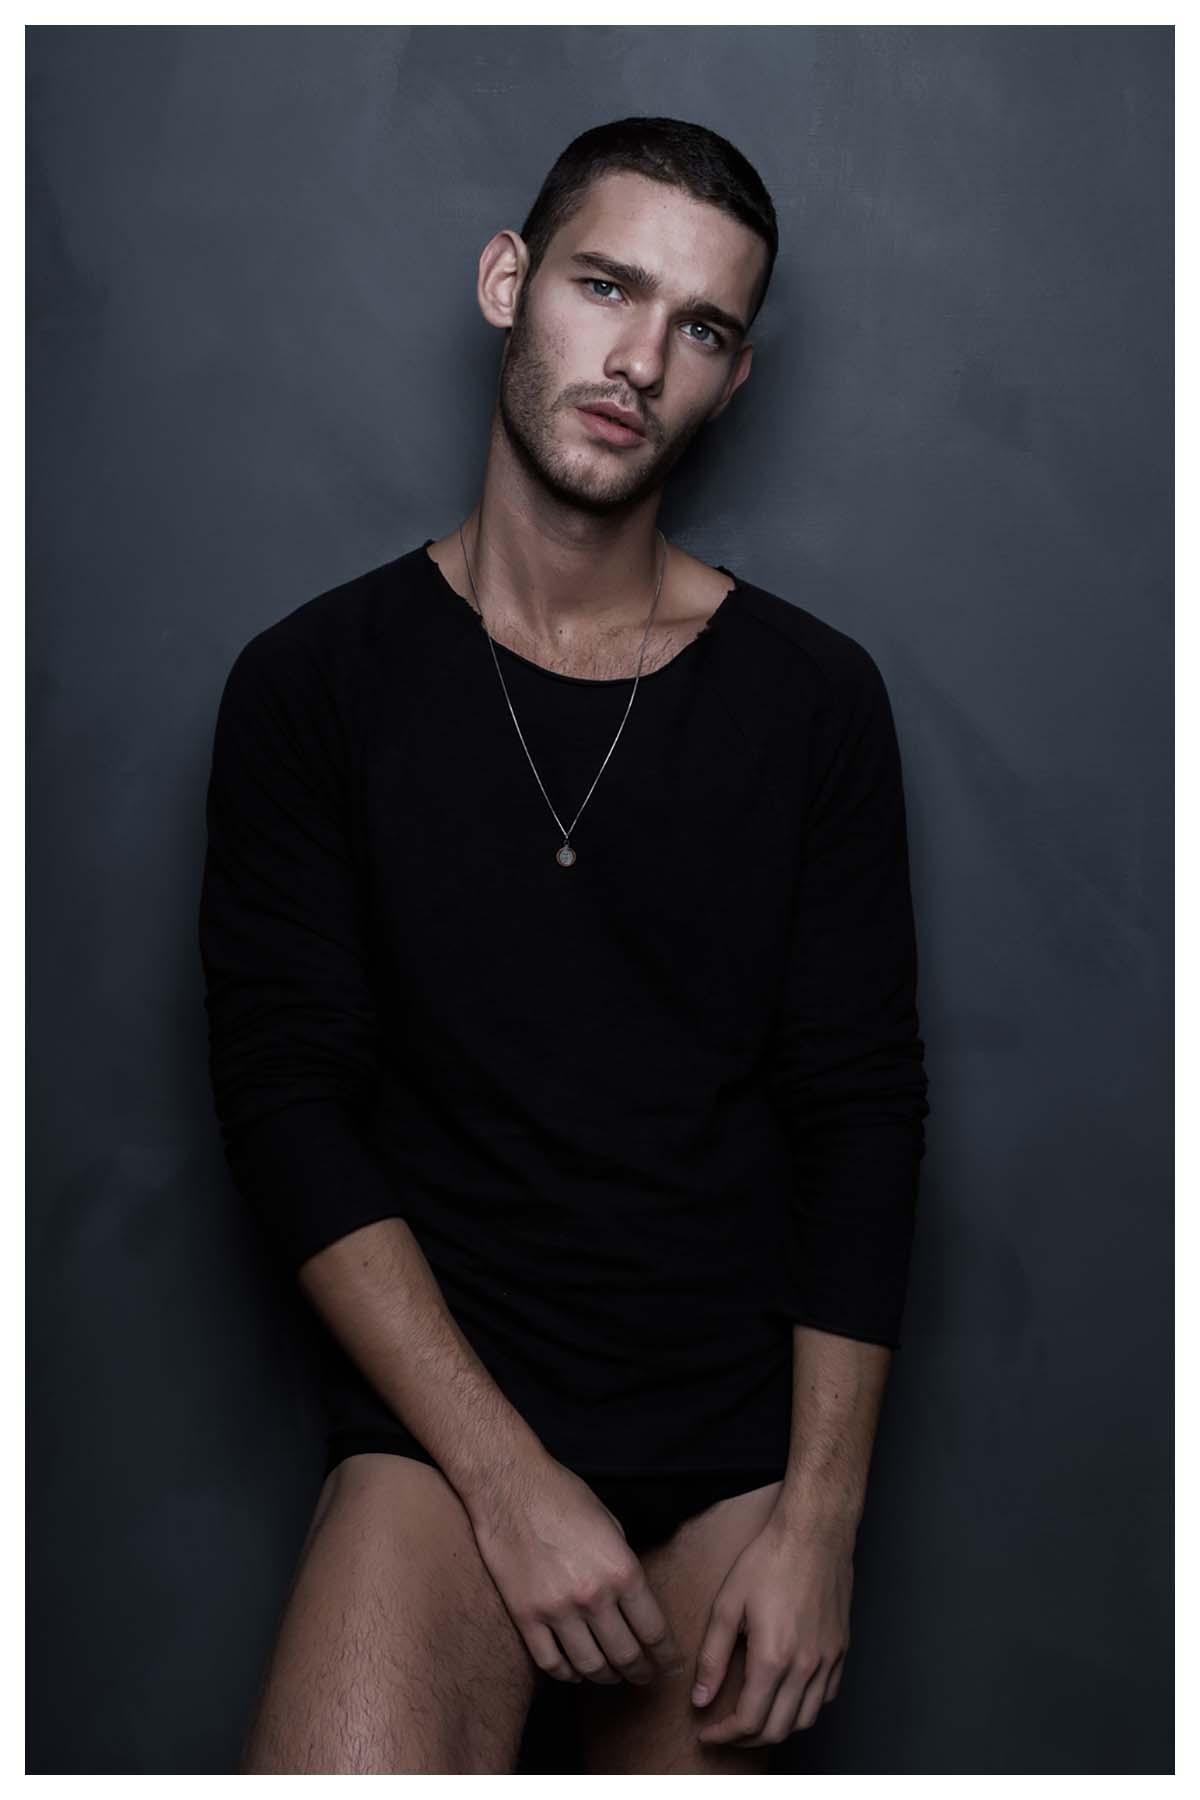 Luigi Ficarelli by David Velez for Brazilian Male Model